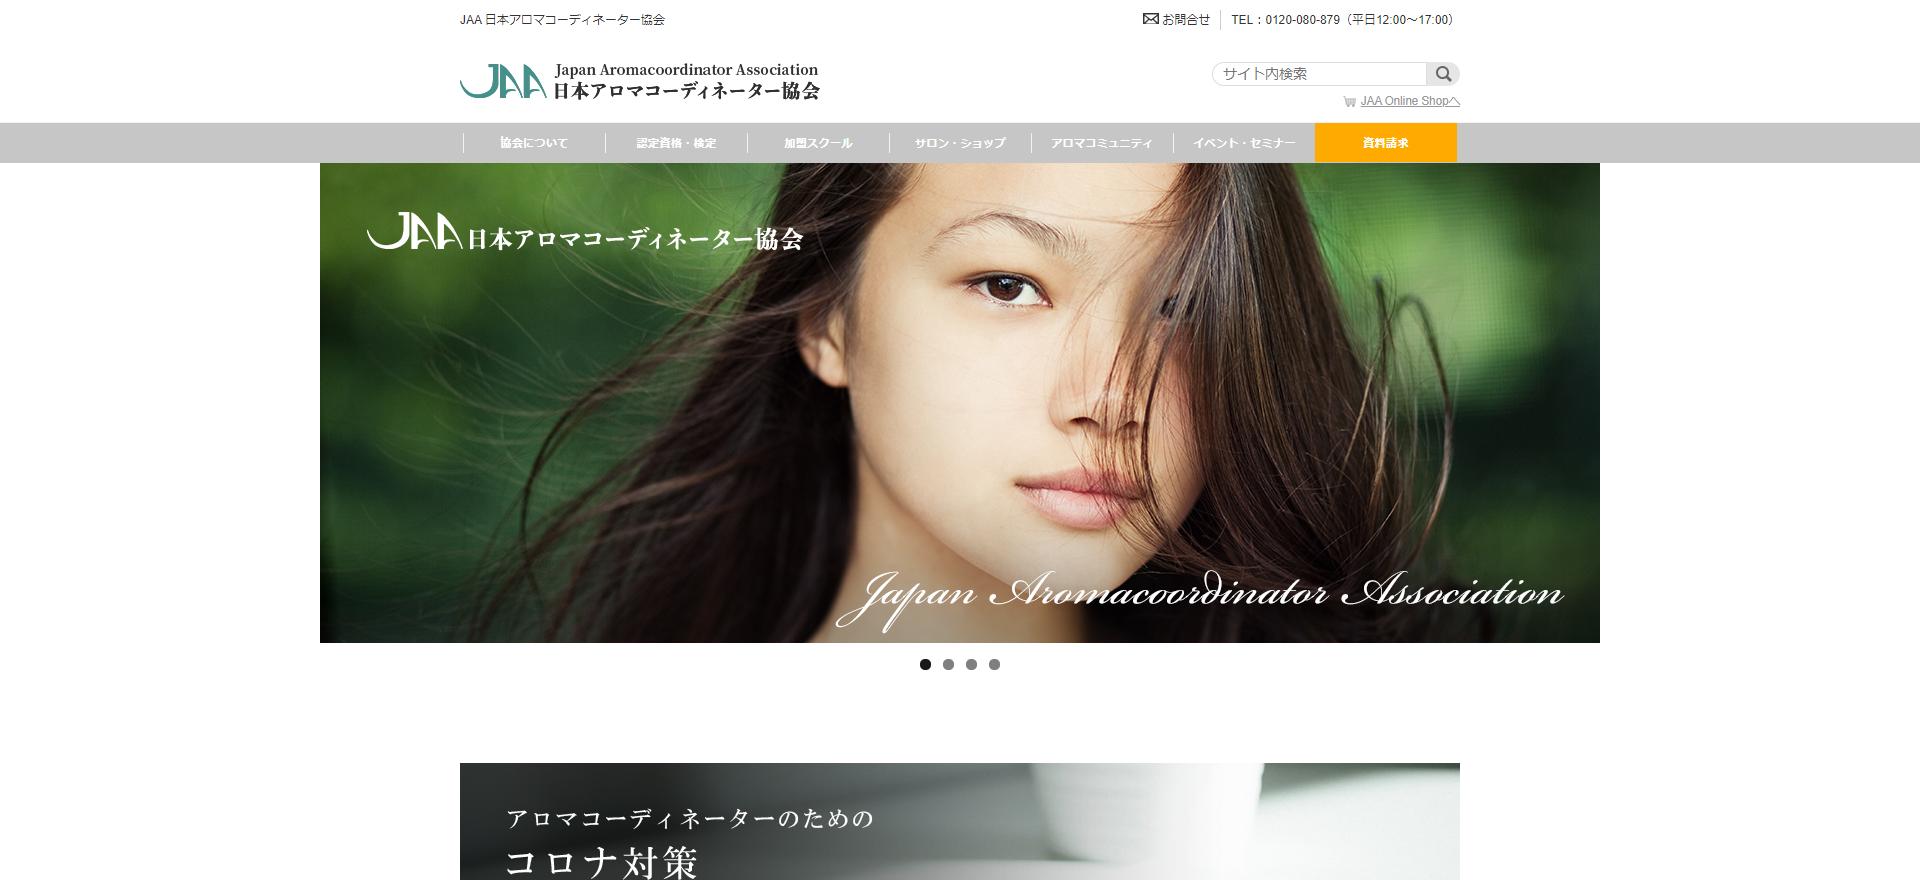 JAA 日本アロマコーディネーター協会